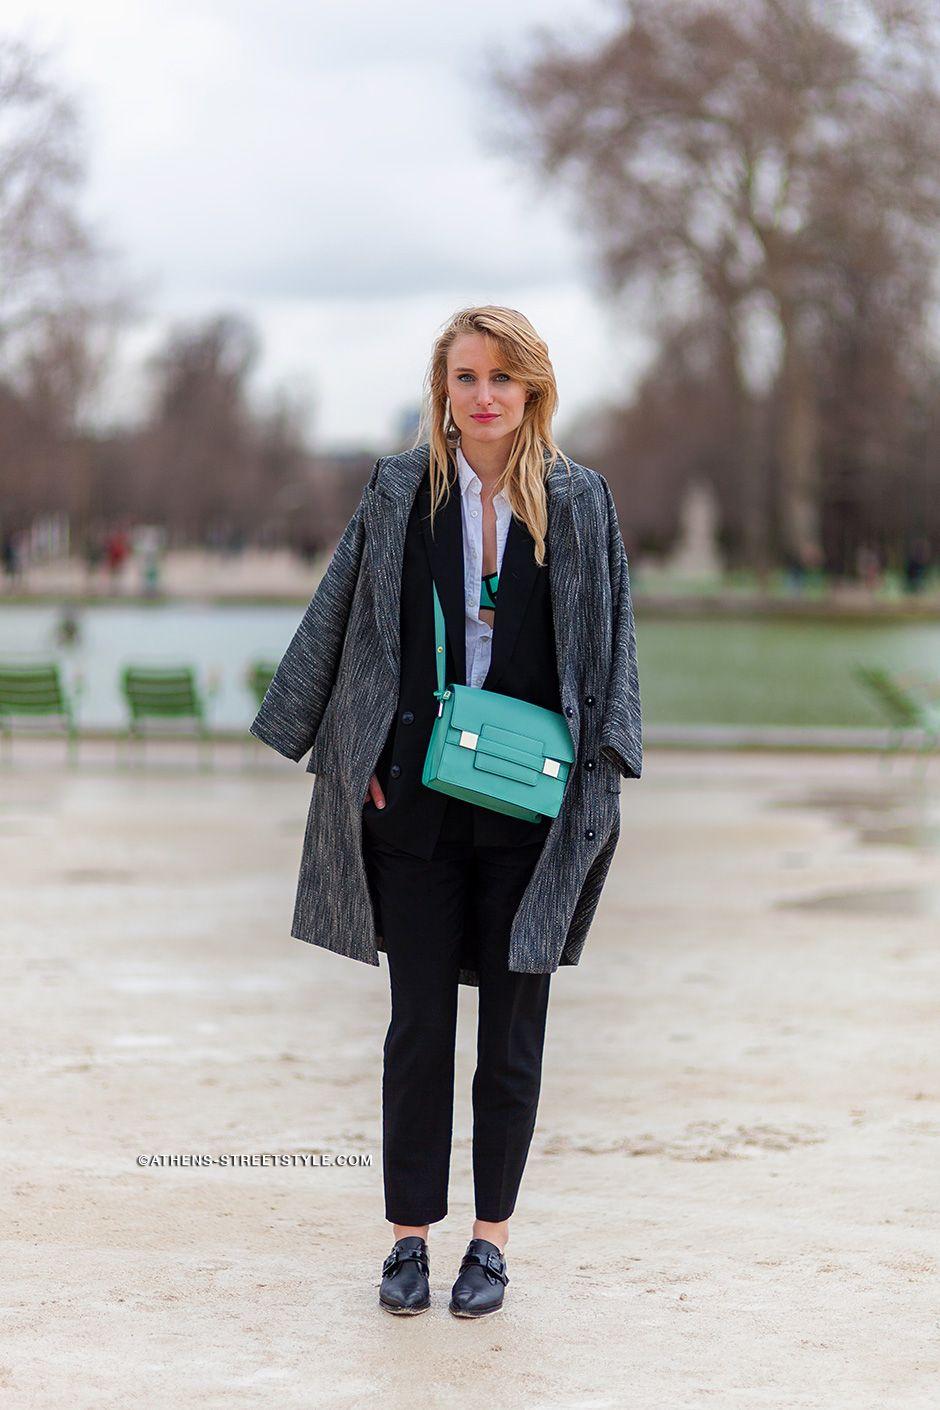 tidy. #RebeccaLaurey in Paris. #RaspberryAndRouge